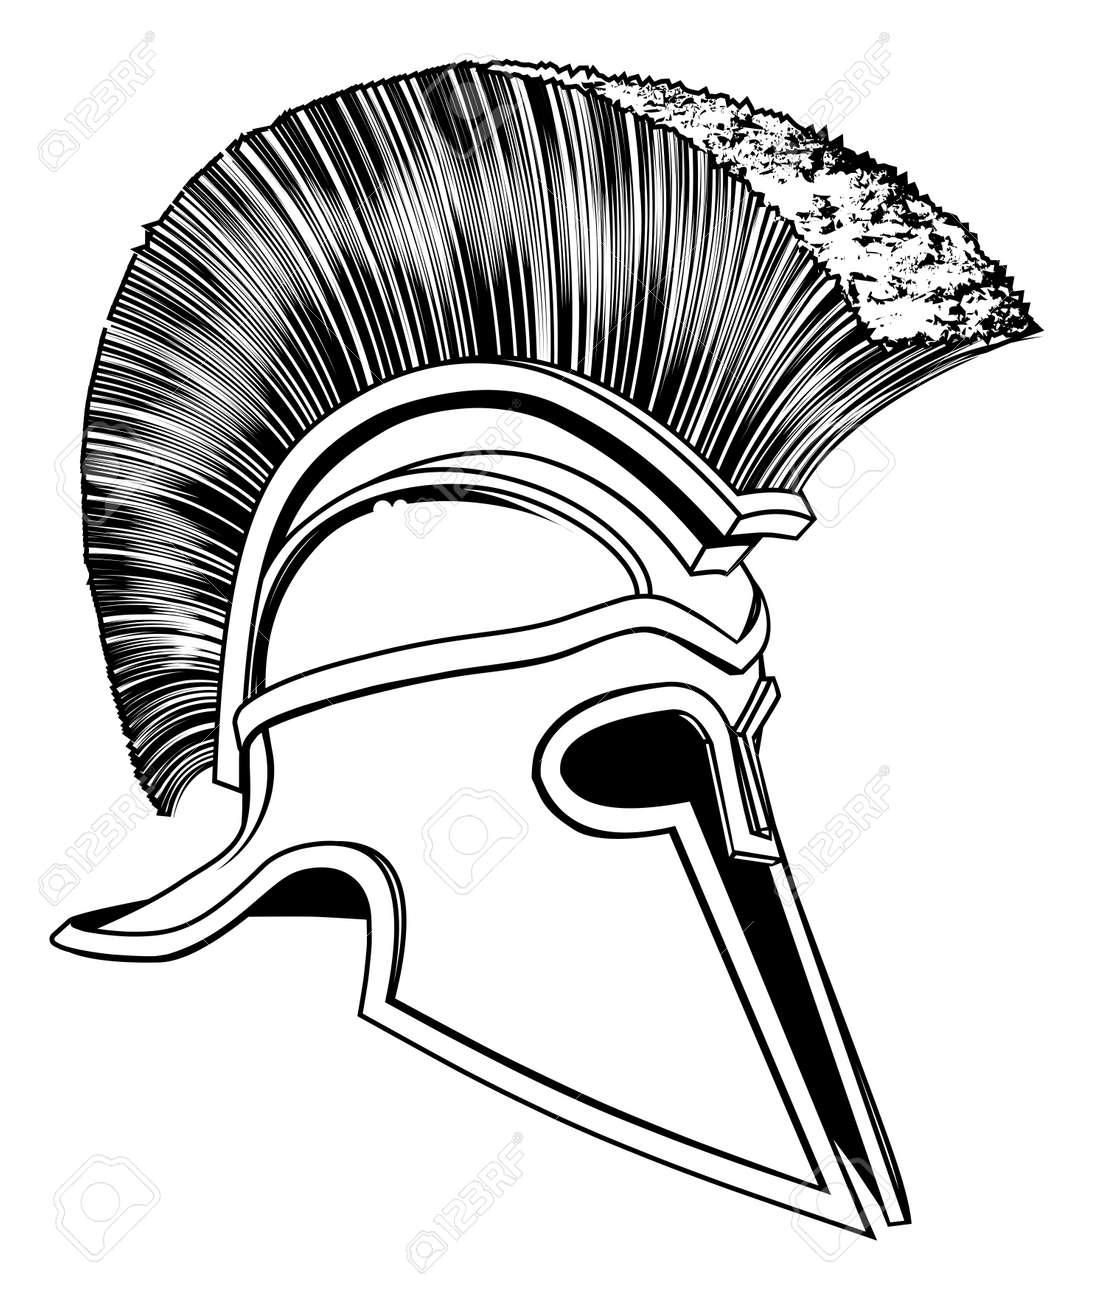 13dde6b8e Graphic of a bronze Trojan Helmet, Spartan helmet, Roman helmet or Greek  helmet.